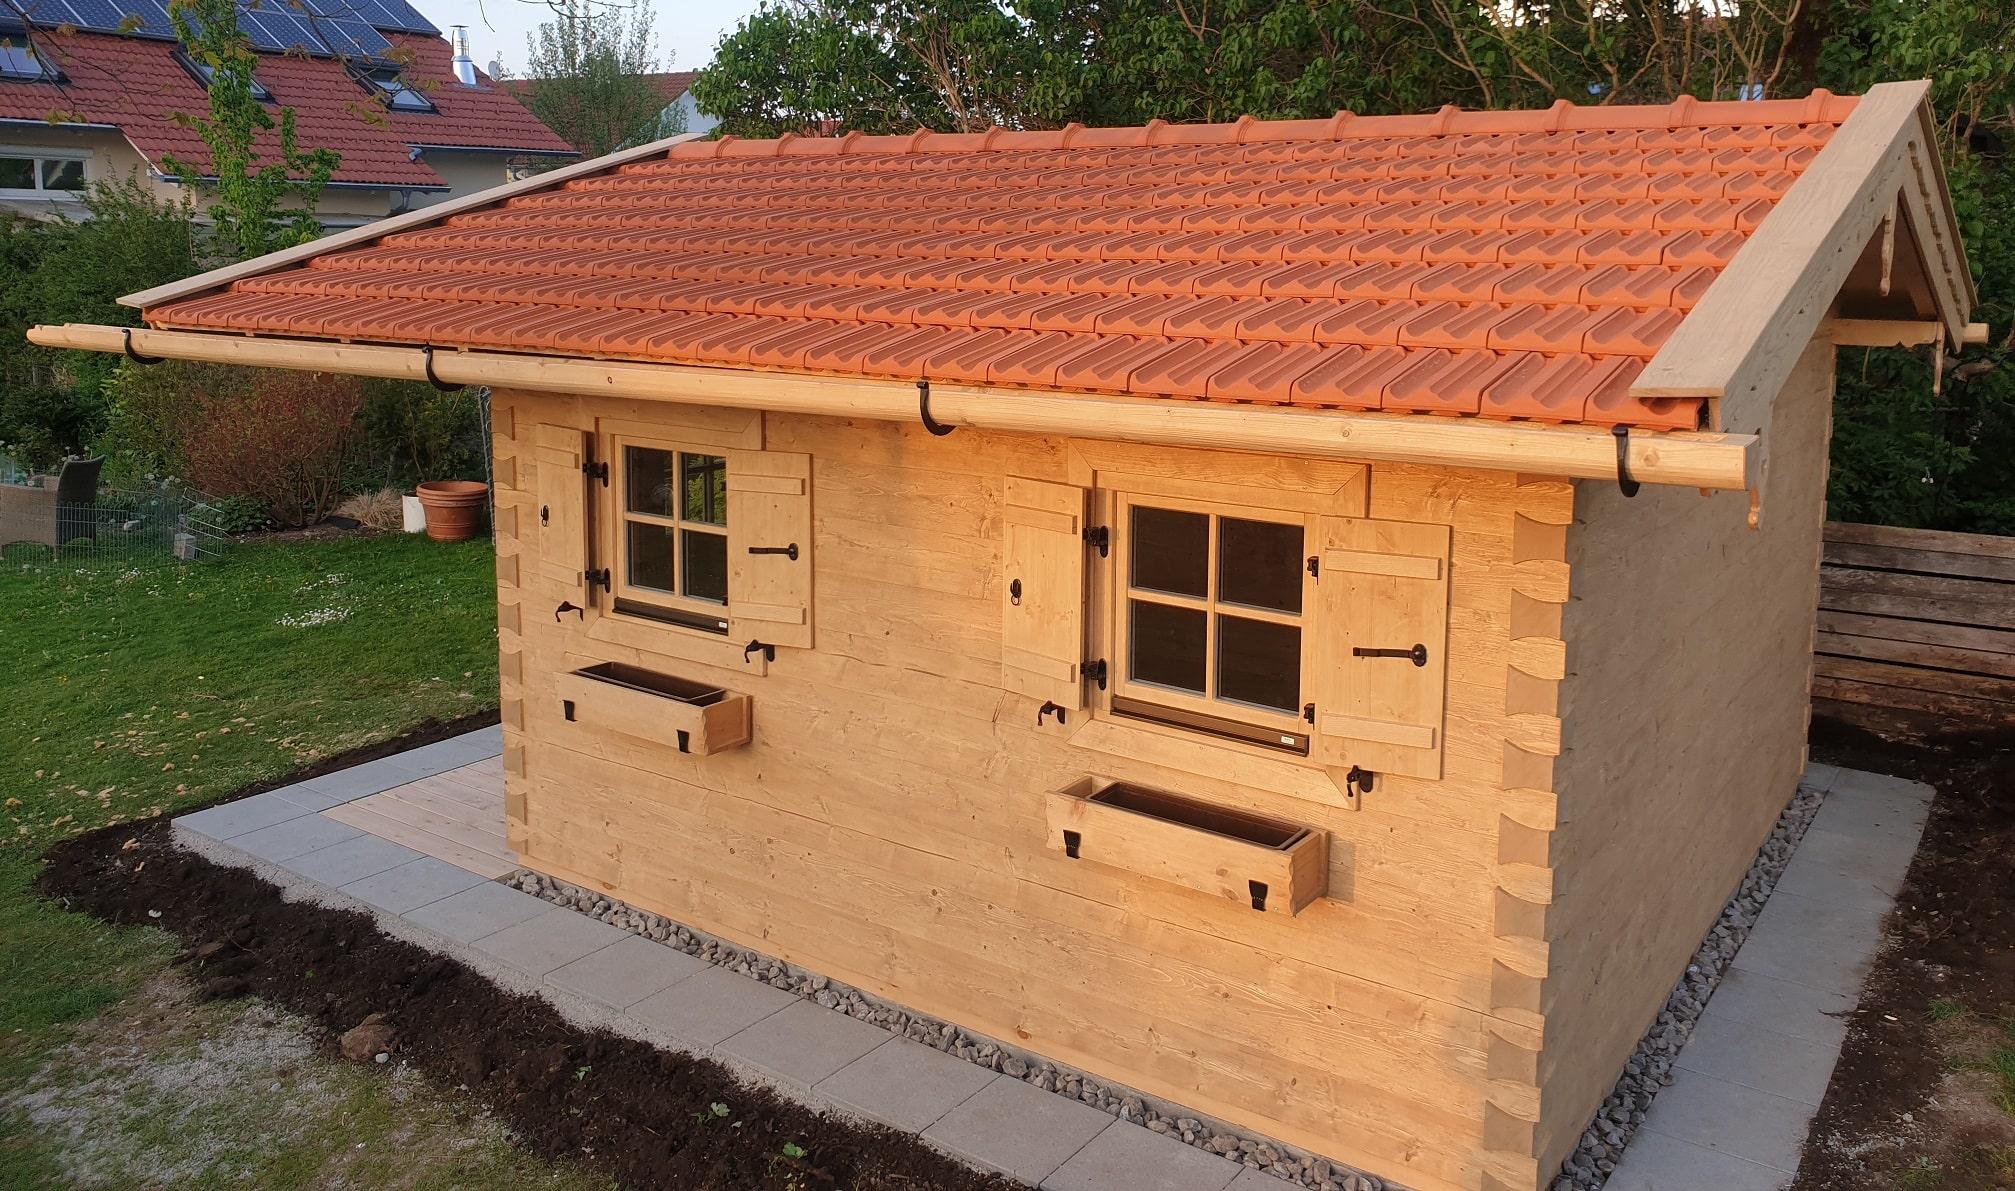 Uriges Rustikales Gartenhaus Im Altholz Stil Nach Mass Ropfl Holzparadies